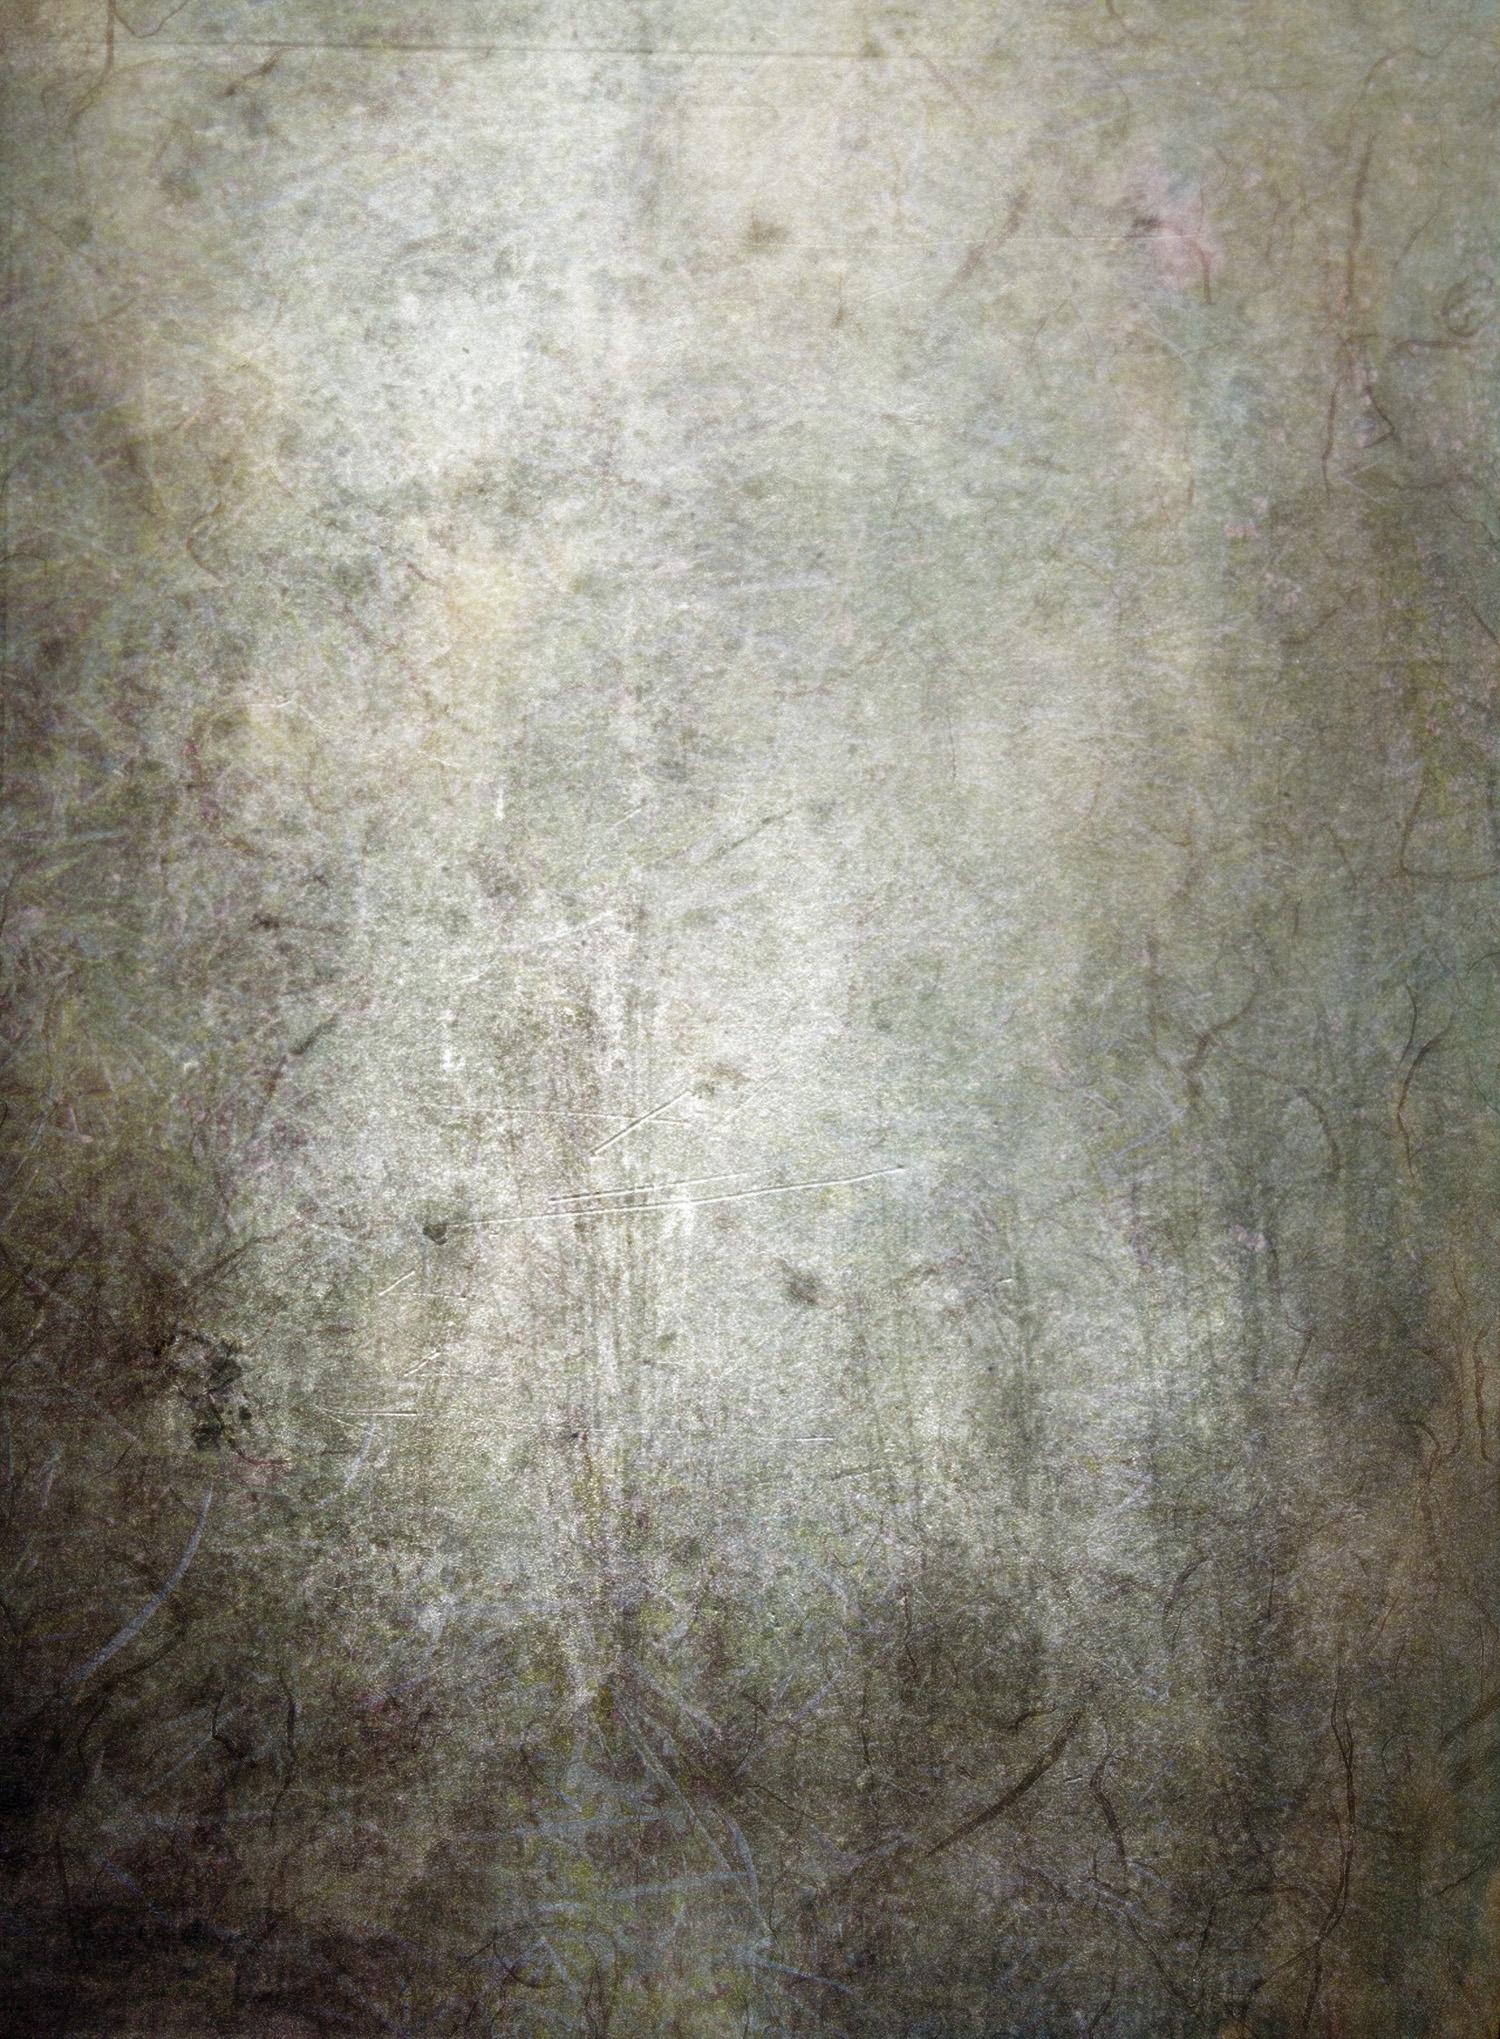 Vintage texture photo